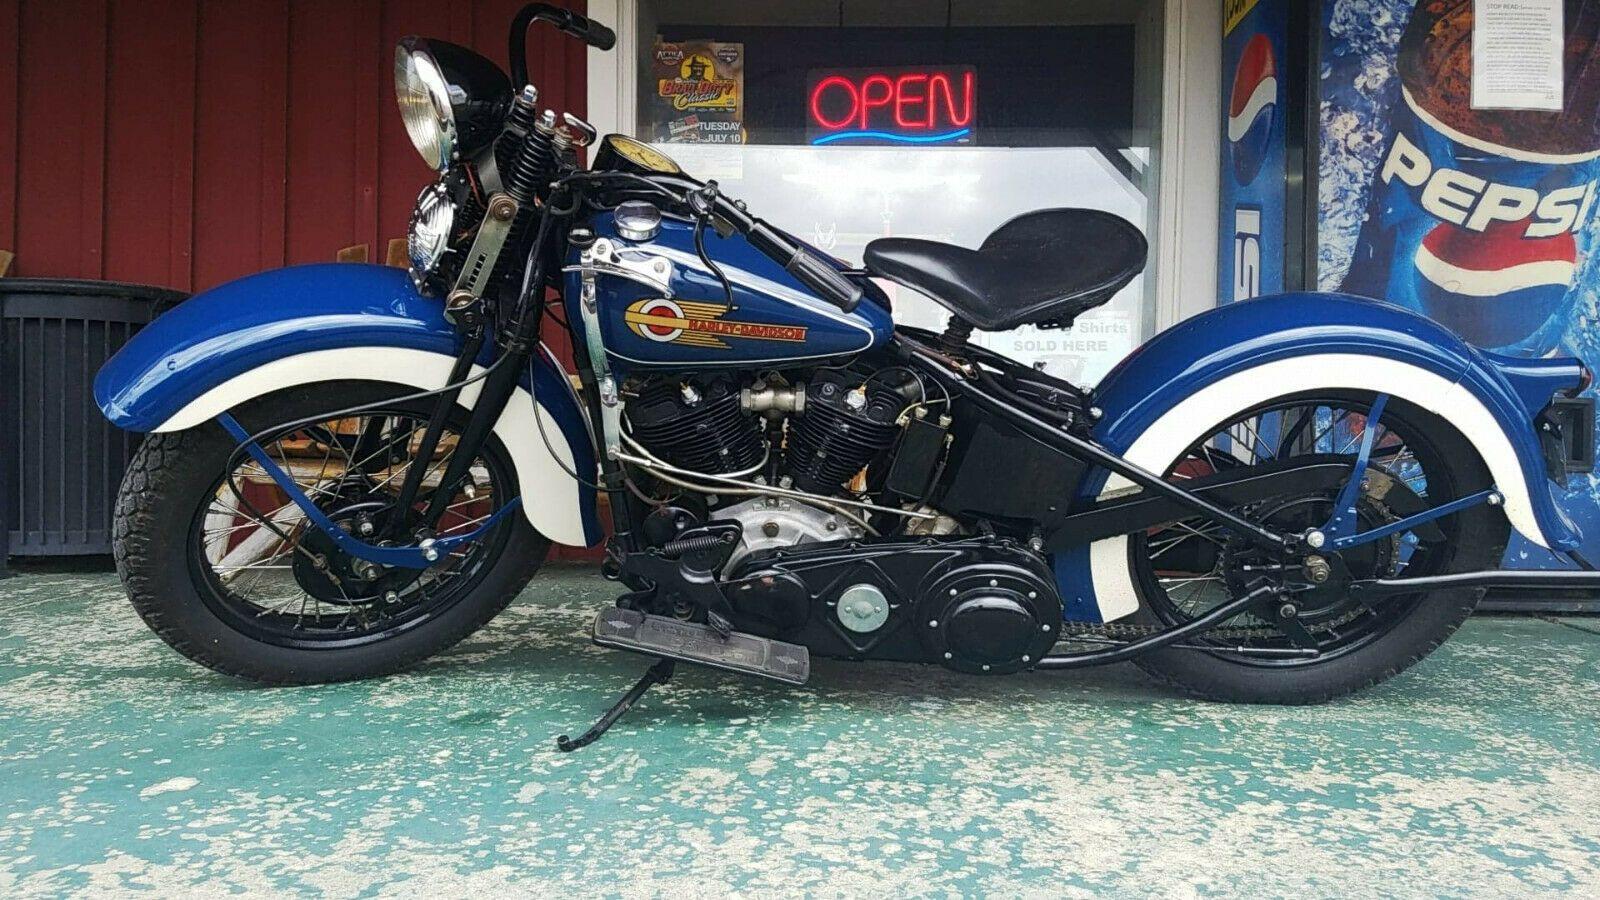 1937 Harley Davidson El Harley Davidson 1937 Knucklehead Harley